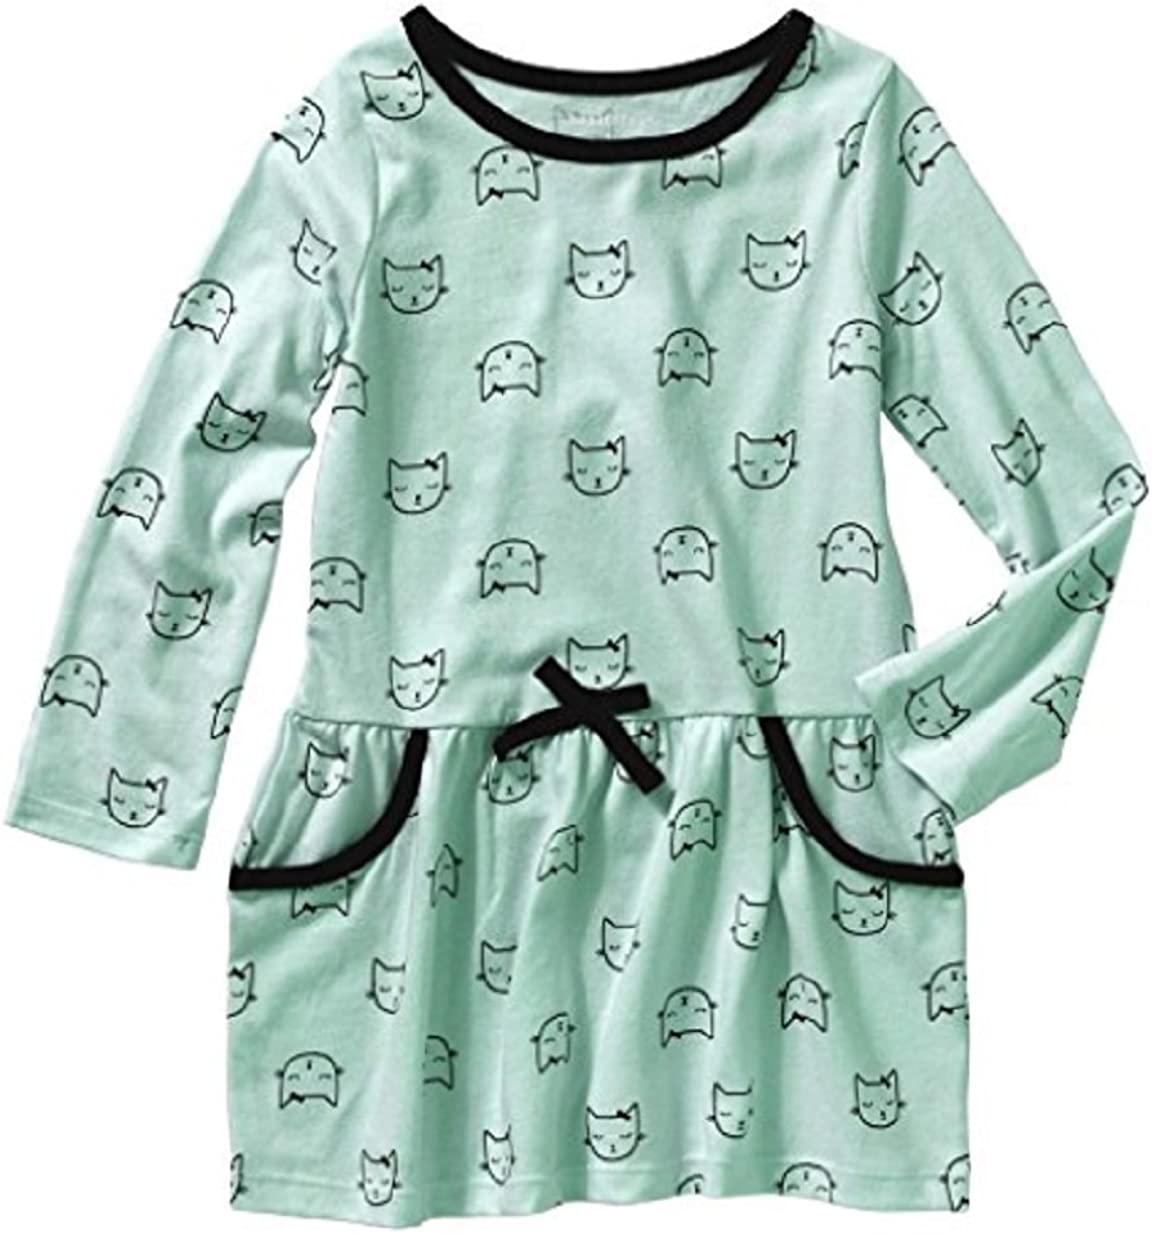 Kitty cat toddler girl Christmas outfit Handmade toddler girls jumpsuit